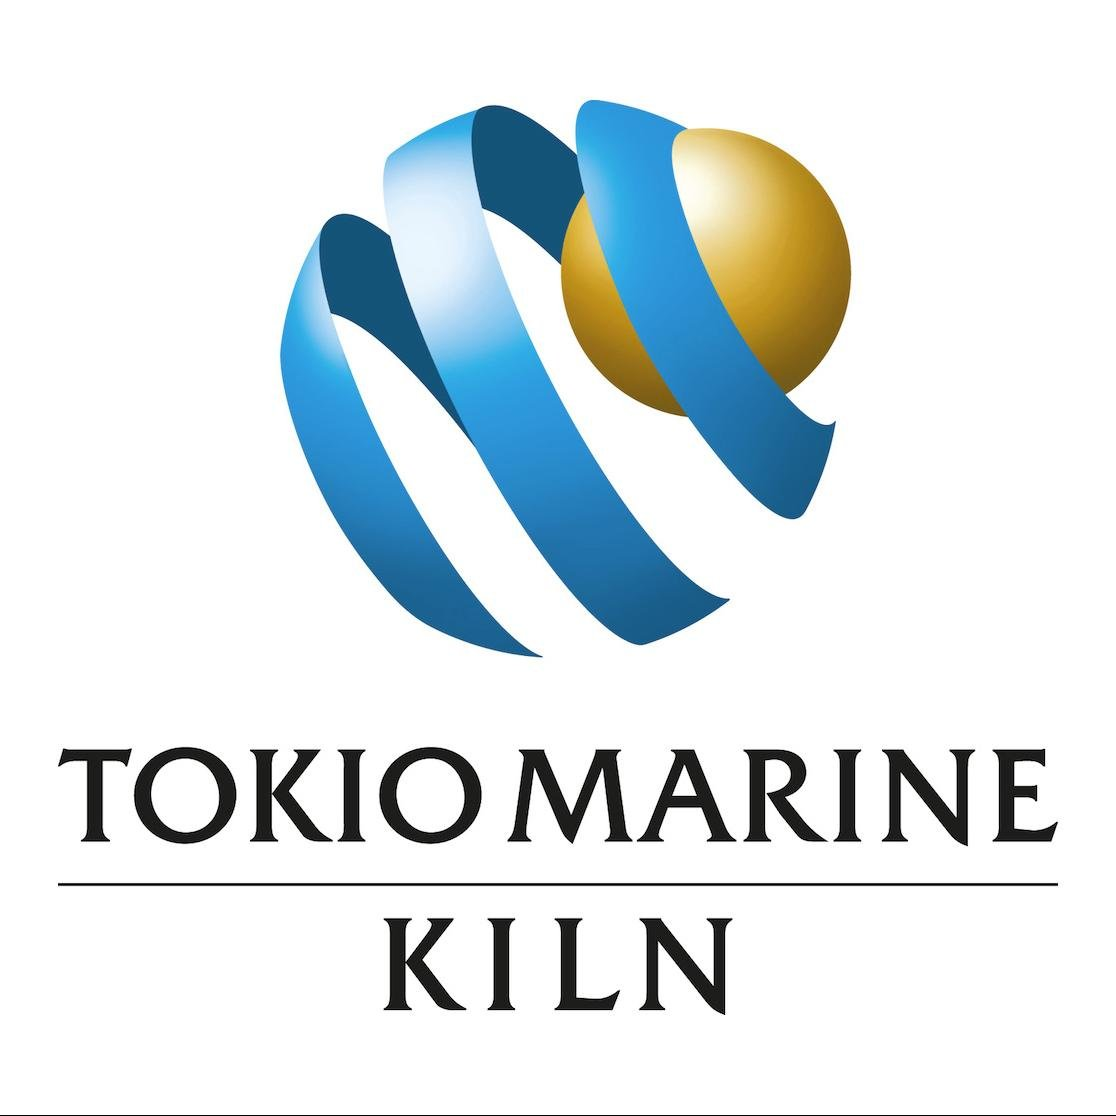 Tokio Marine Kiln Phone Numbers